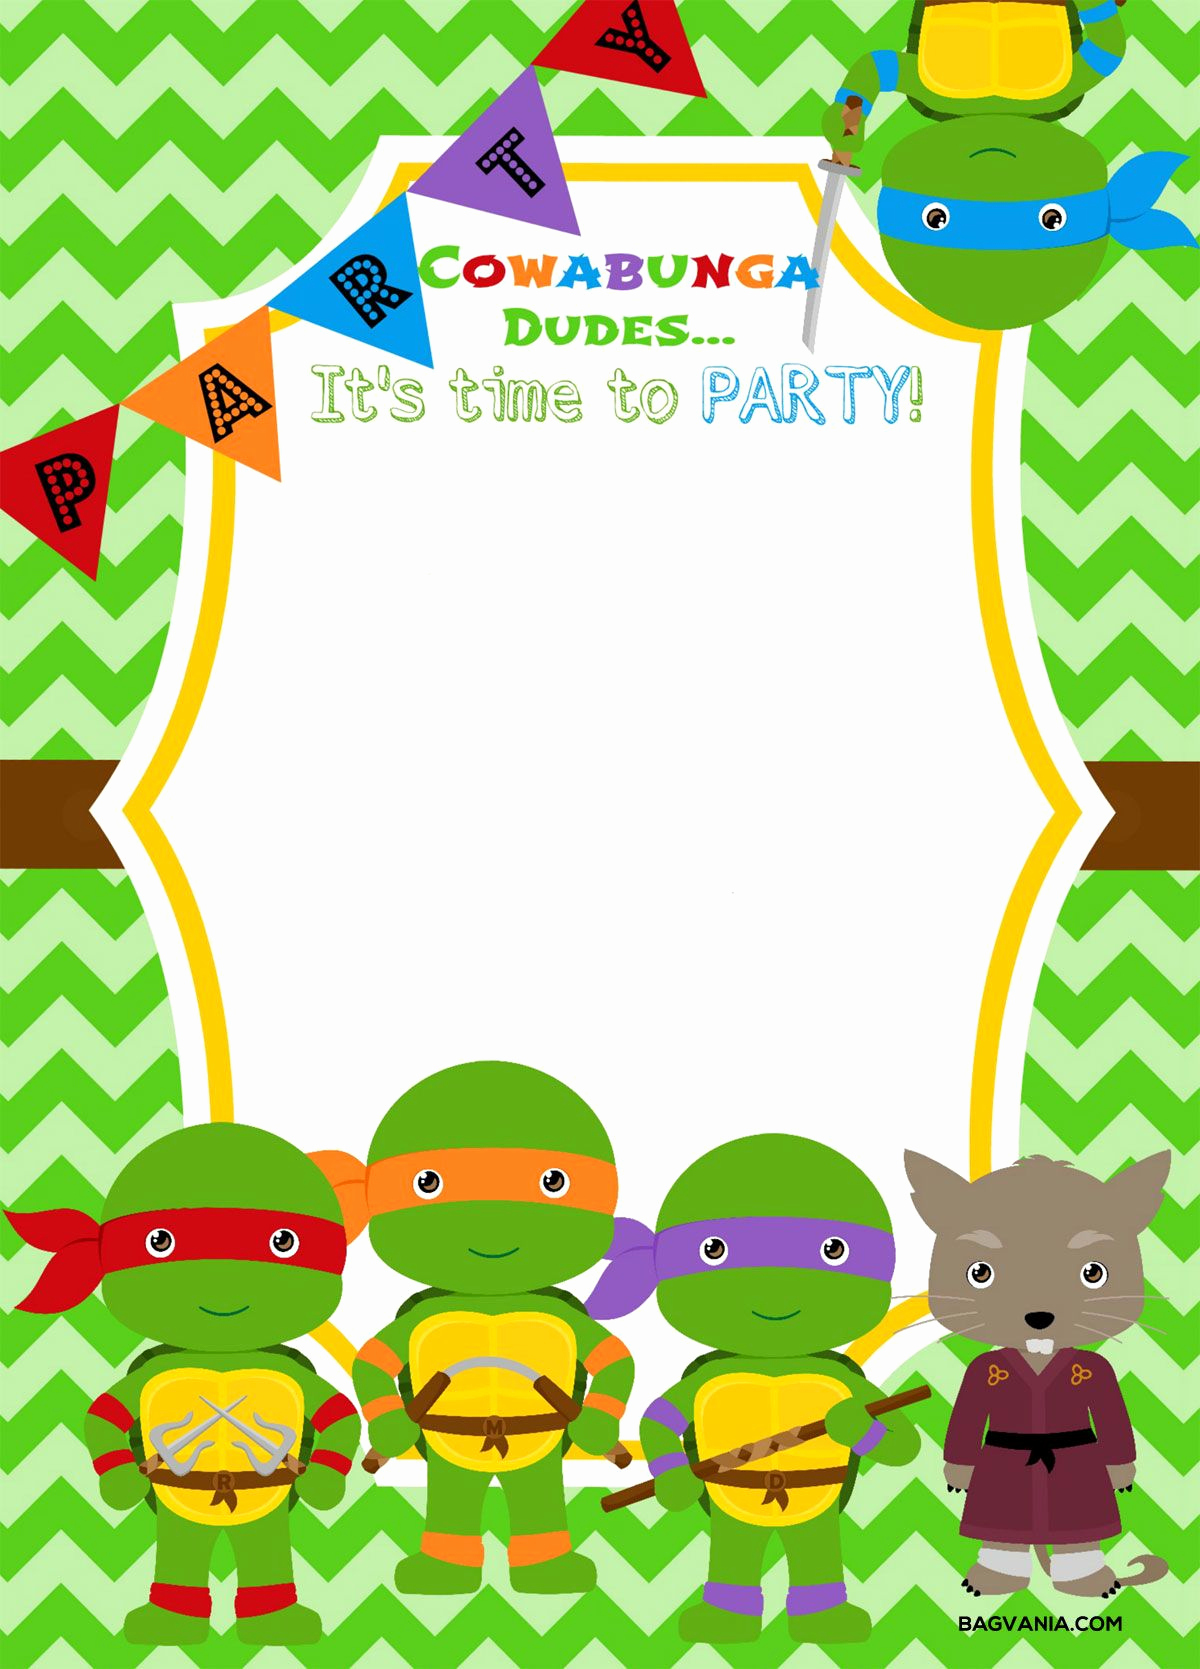 Ninja Turtles Birthday Invitation Awesome Download now Free Printable Ninja Turtle Birthday Party